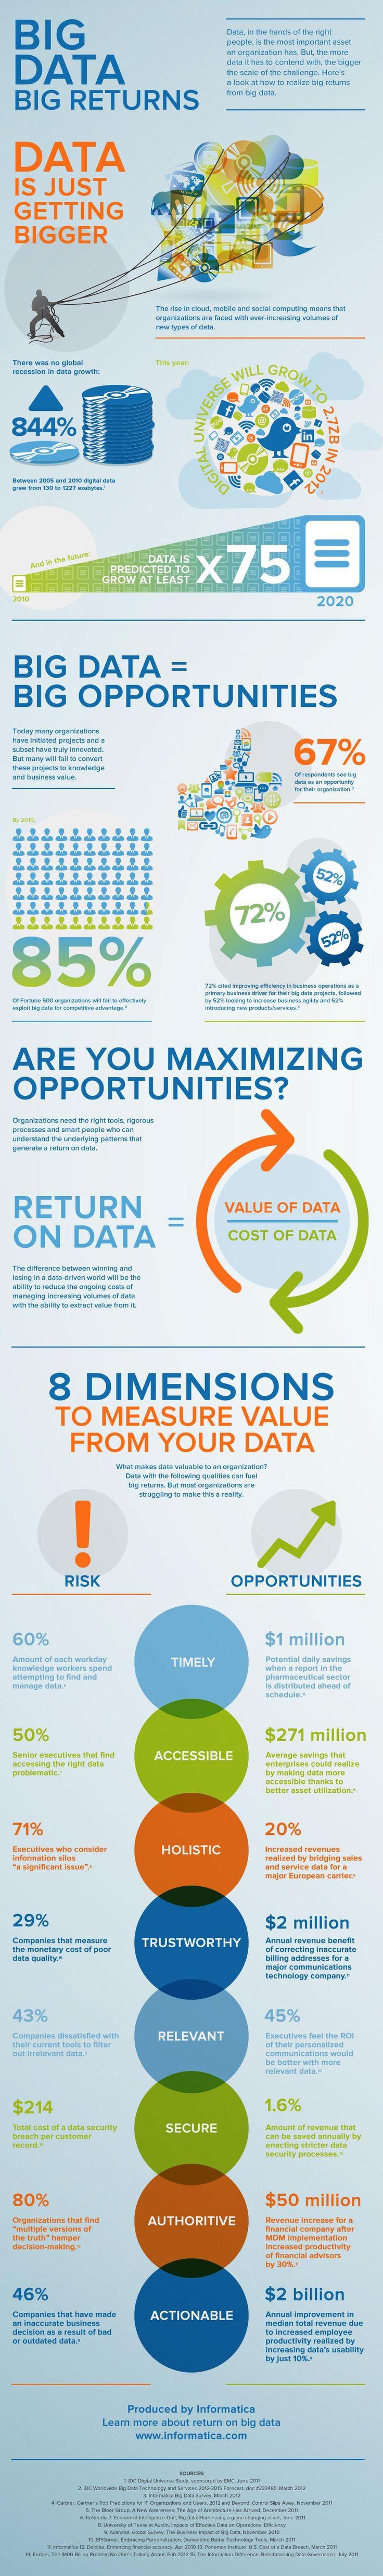 Big Data, Big Returns [INFOGRAPHIC]